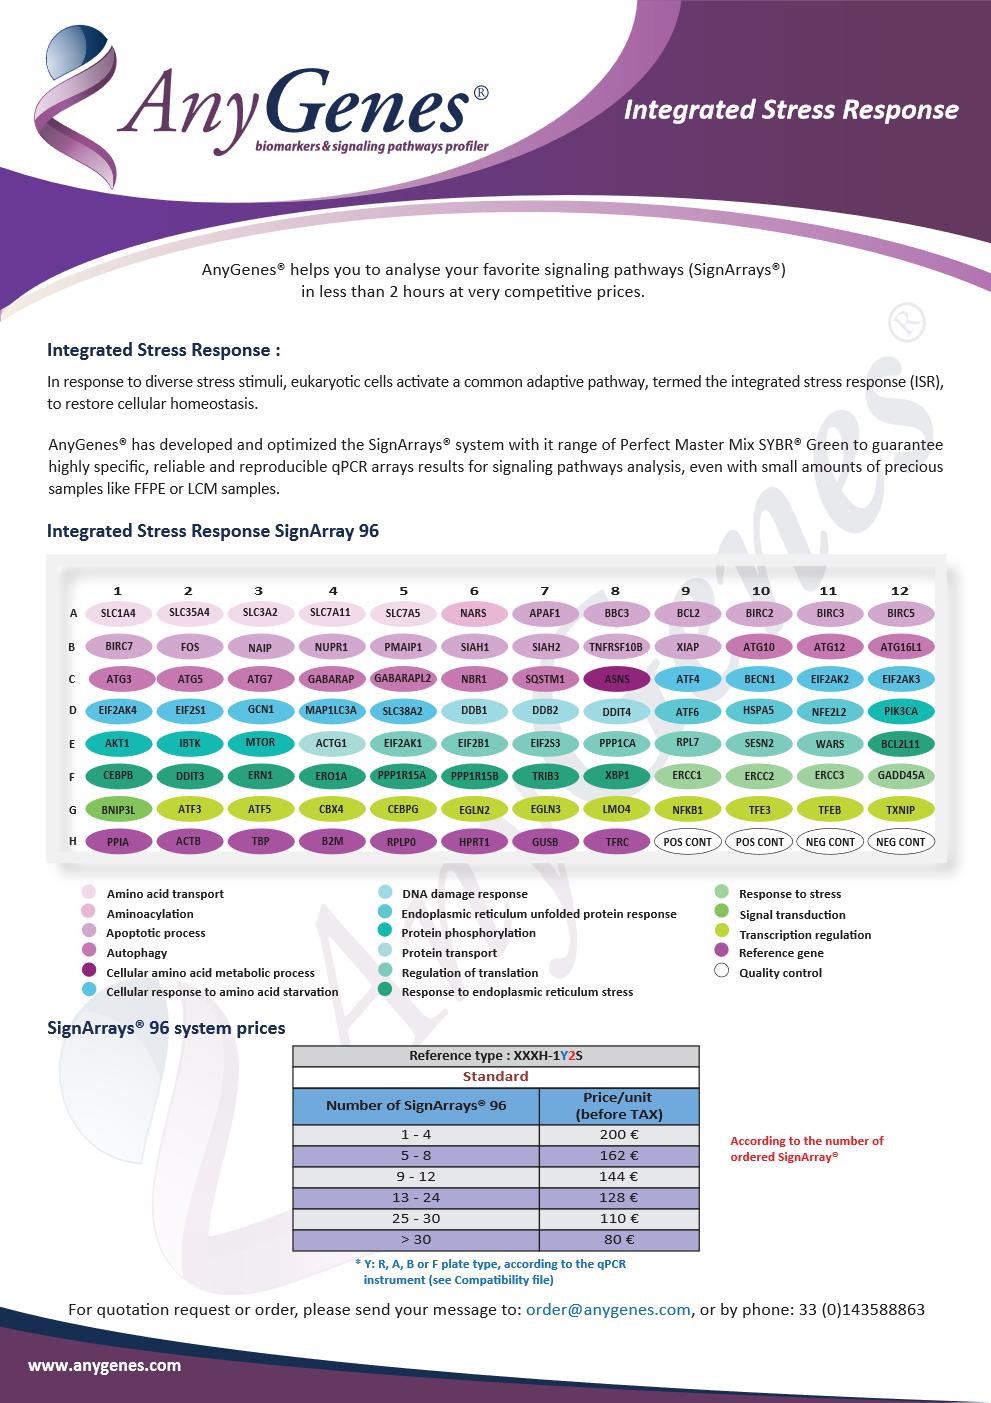 Flyer Integrated Stress Response